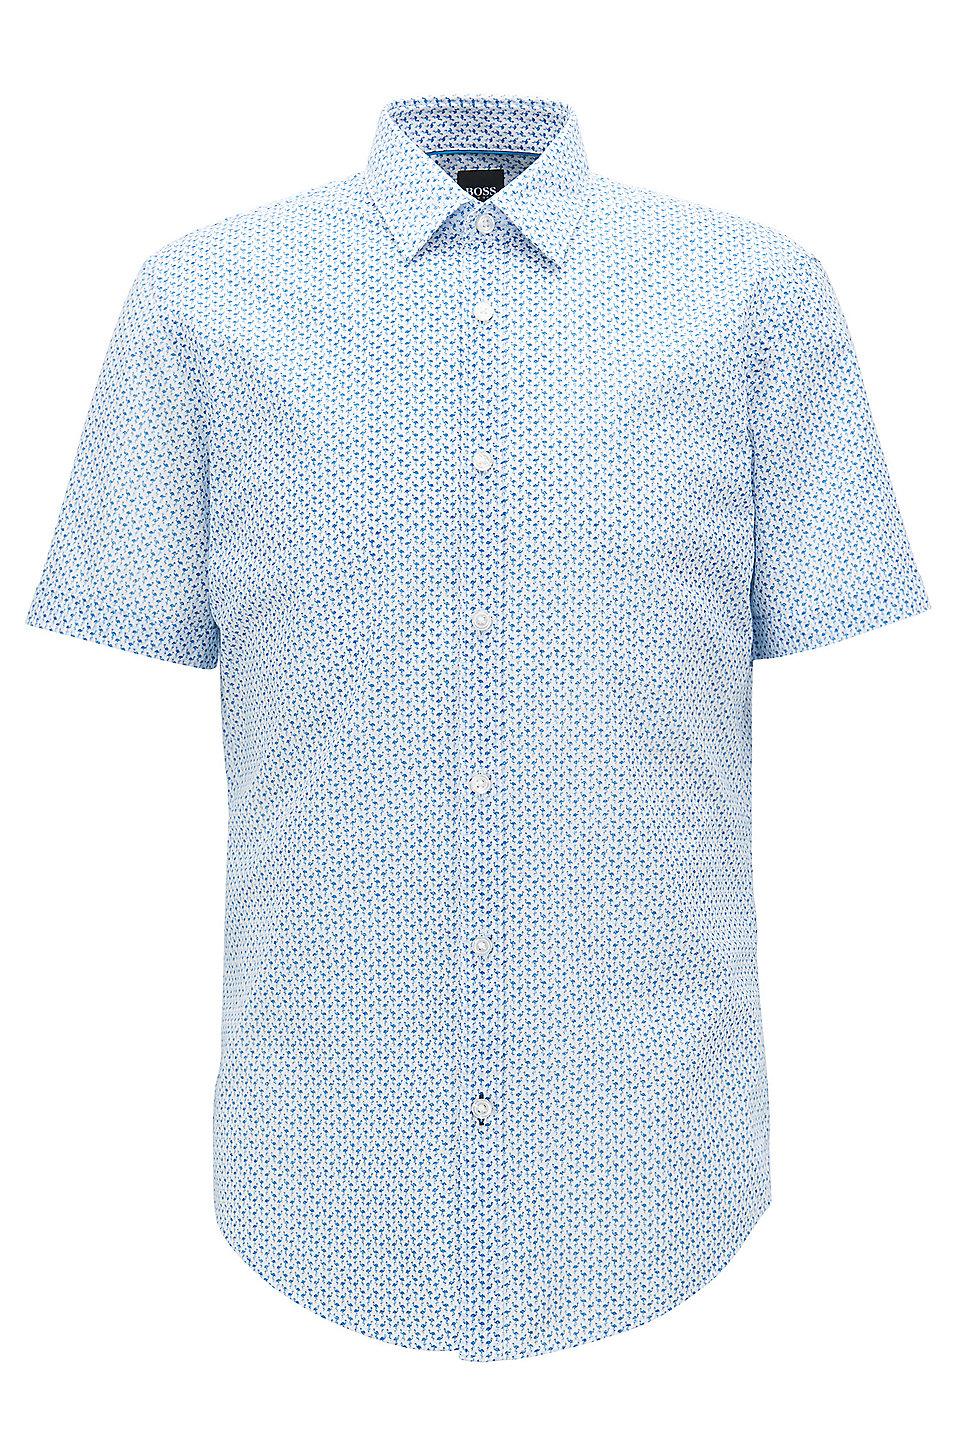 59a3014c4e1f Hugo Boss Slim Fit White Dress Shirt - Cotswold Hire